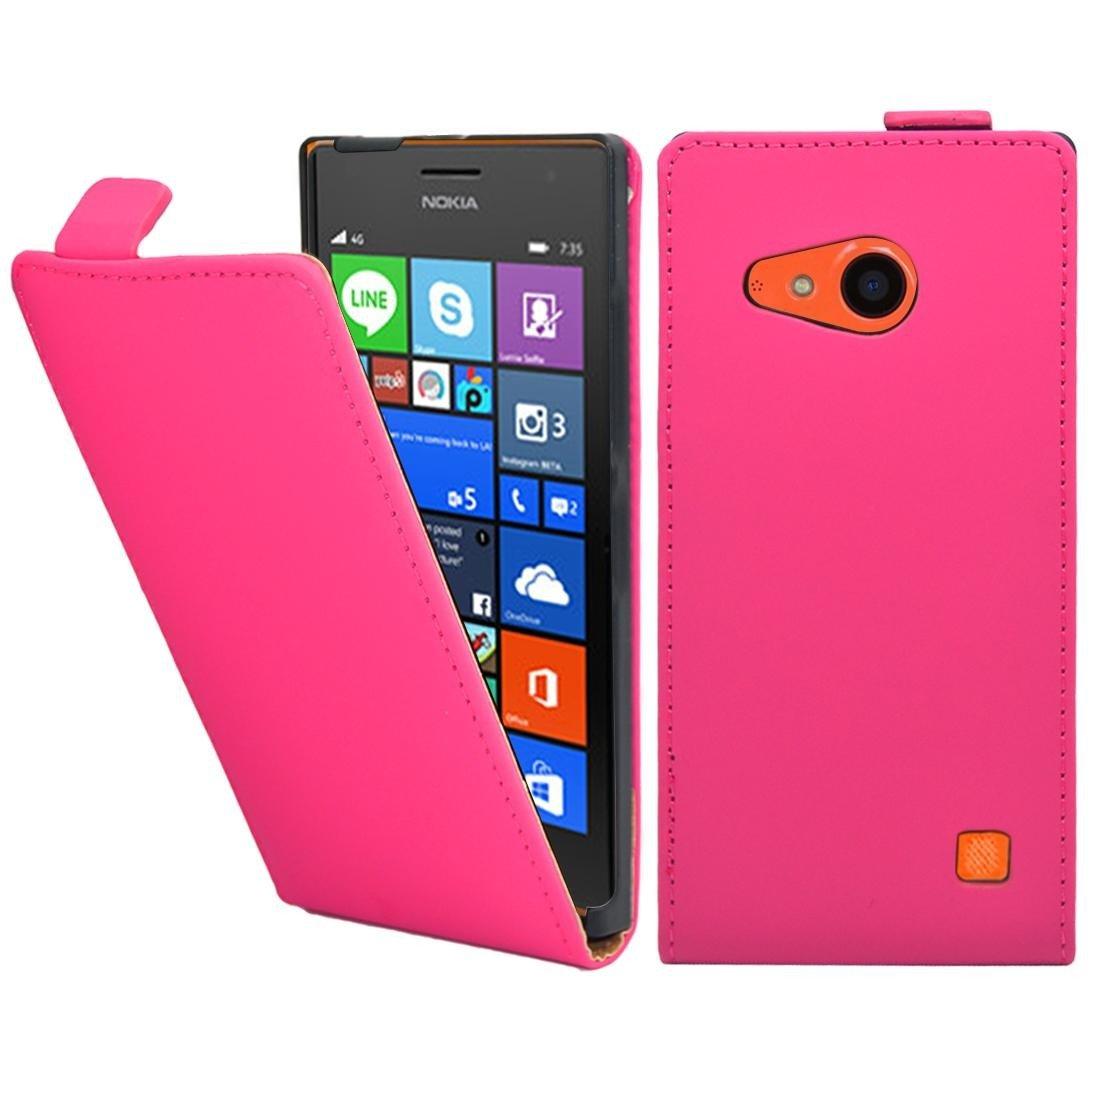 Nokia Lumia 735 Case Thinkmobile Pink Pu Leather Asha 501 Dual Sim Resmi Cyan Electronics